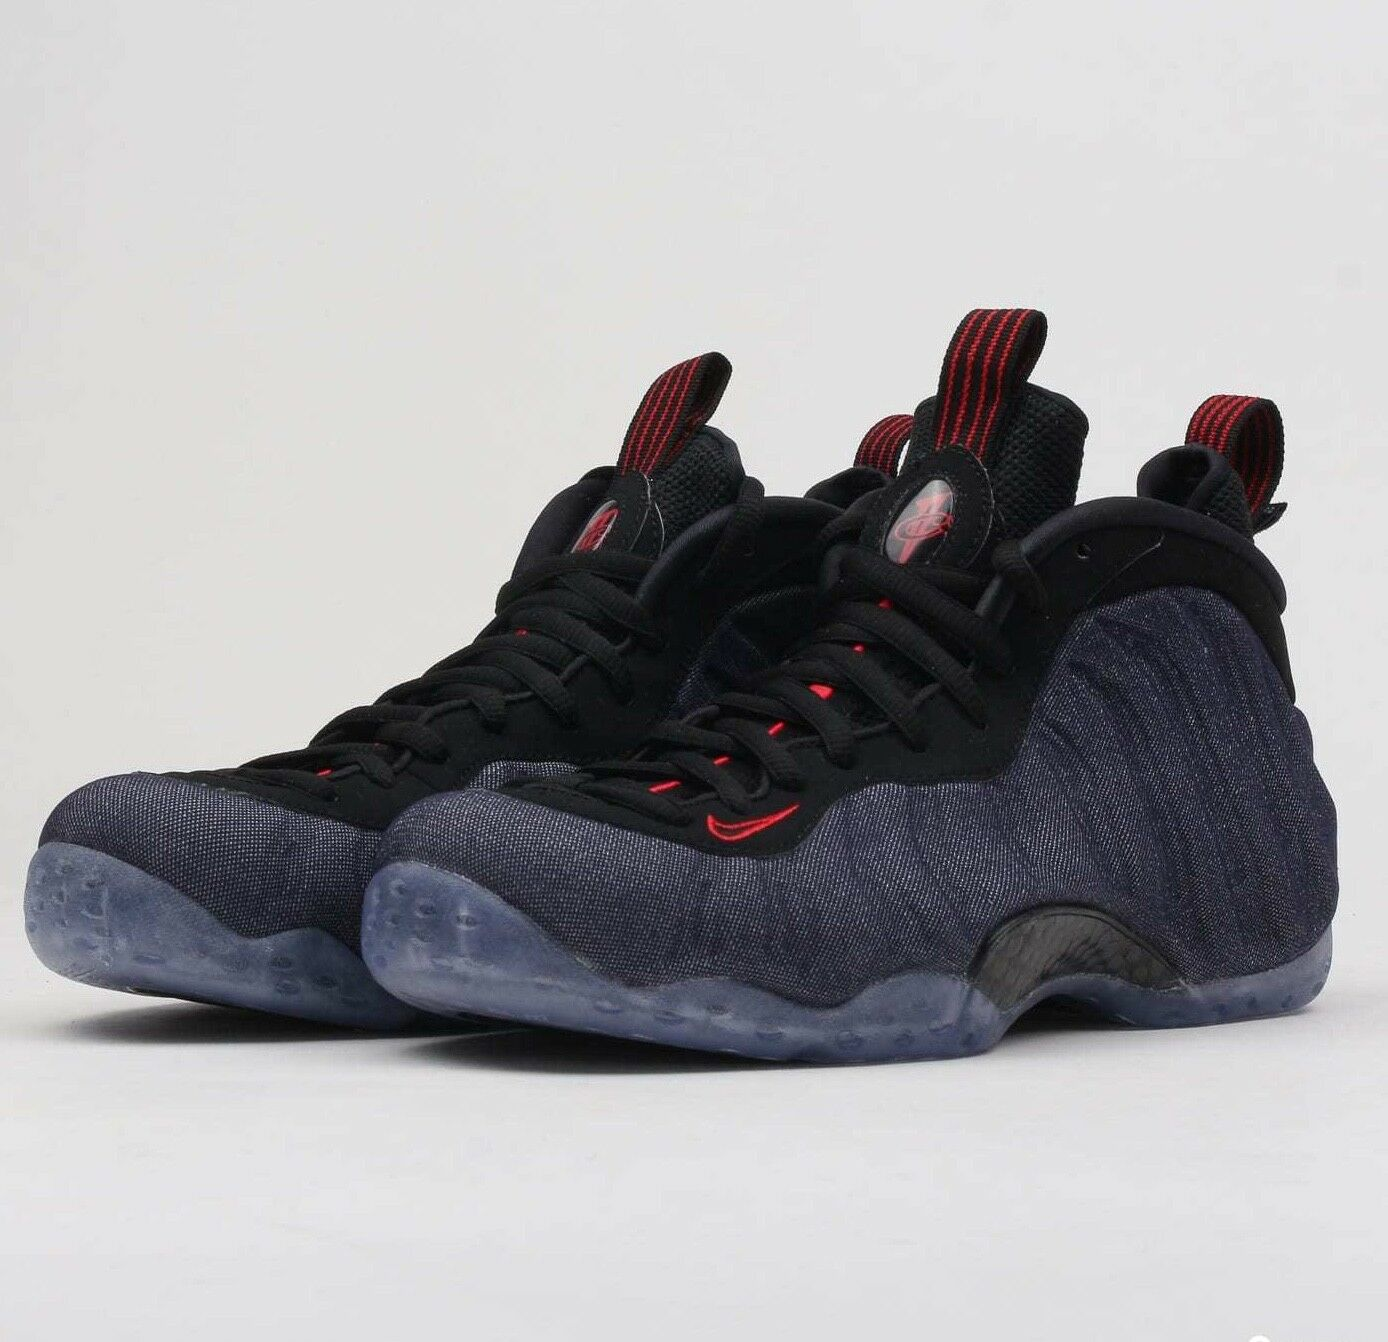 buy popular a56a1 c2df8 ... coupon code for nike air foamposite one denim 314996 404 negro negro  negro obsidiana rojo para